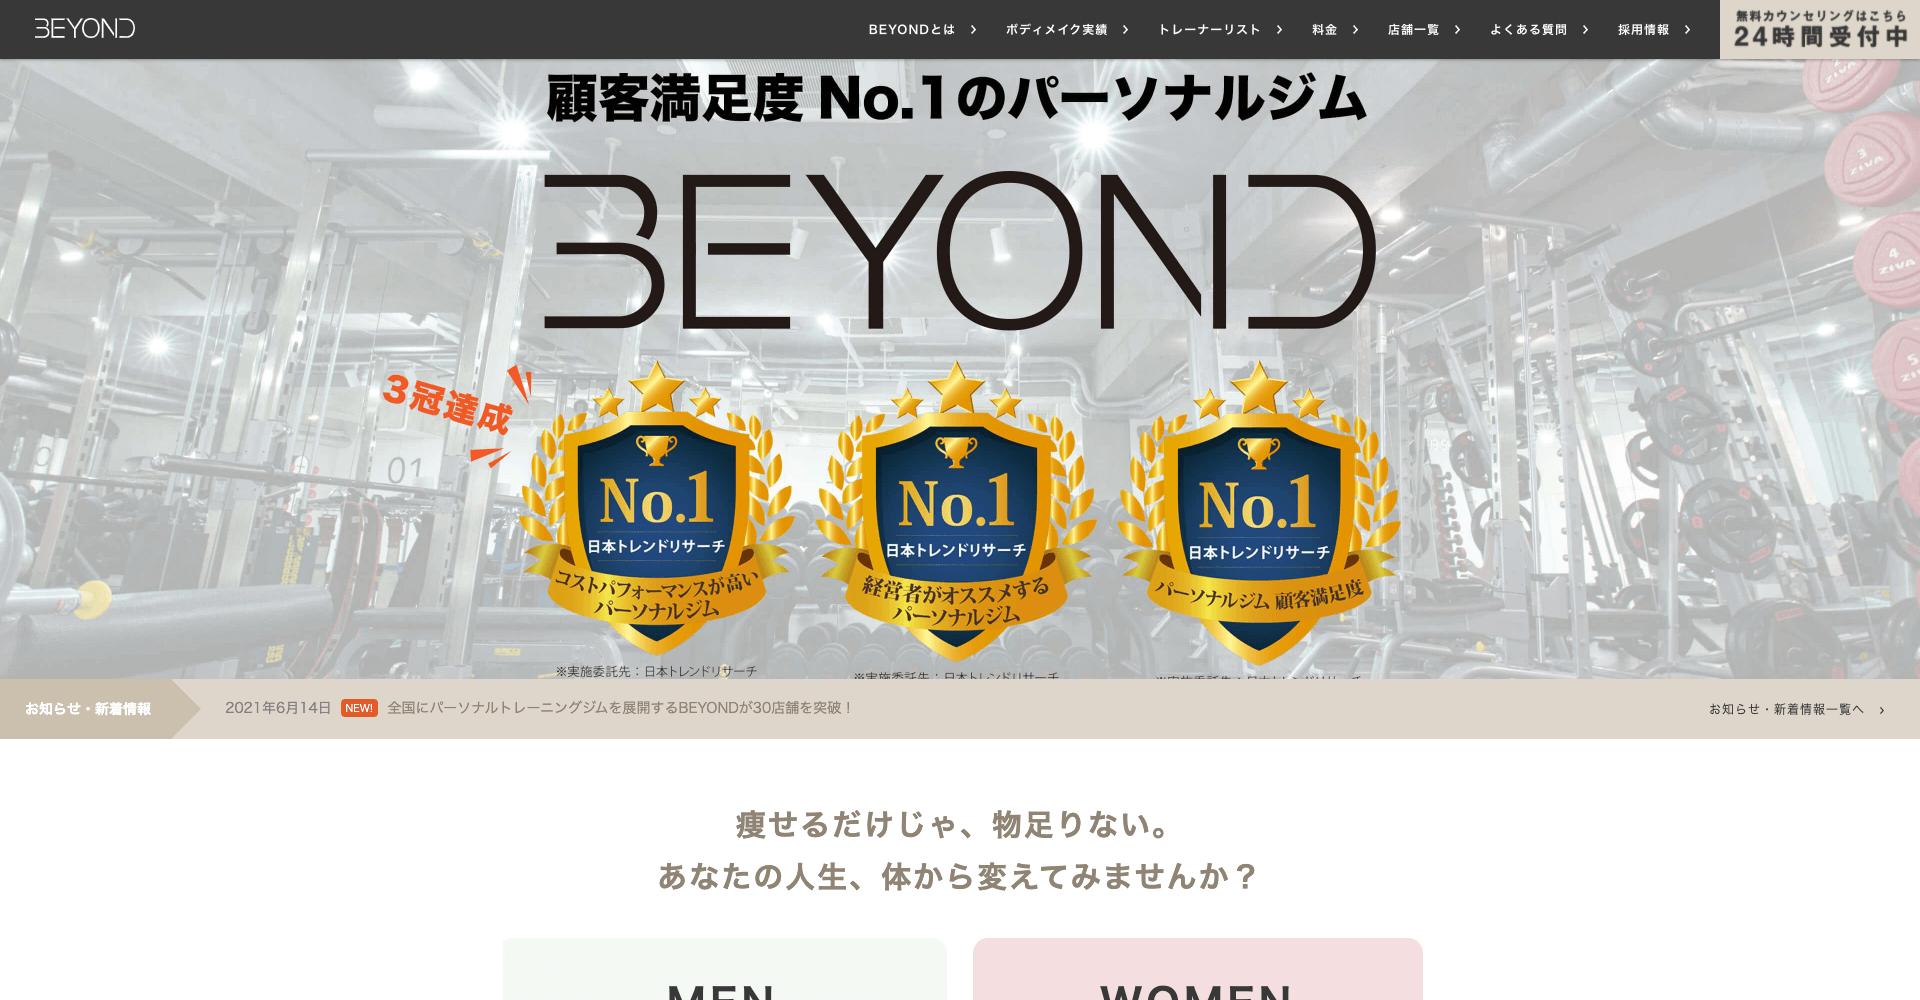 BEYOND(ビヨンド)ジム 千葉駅前店